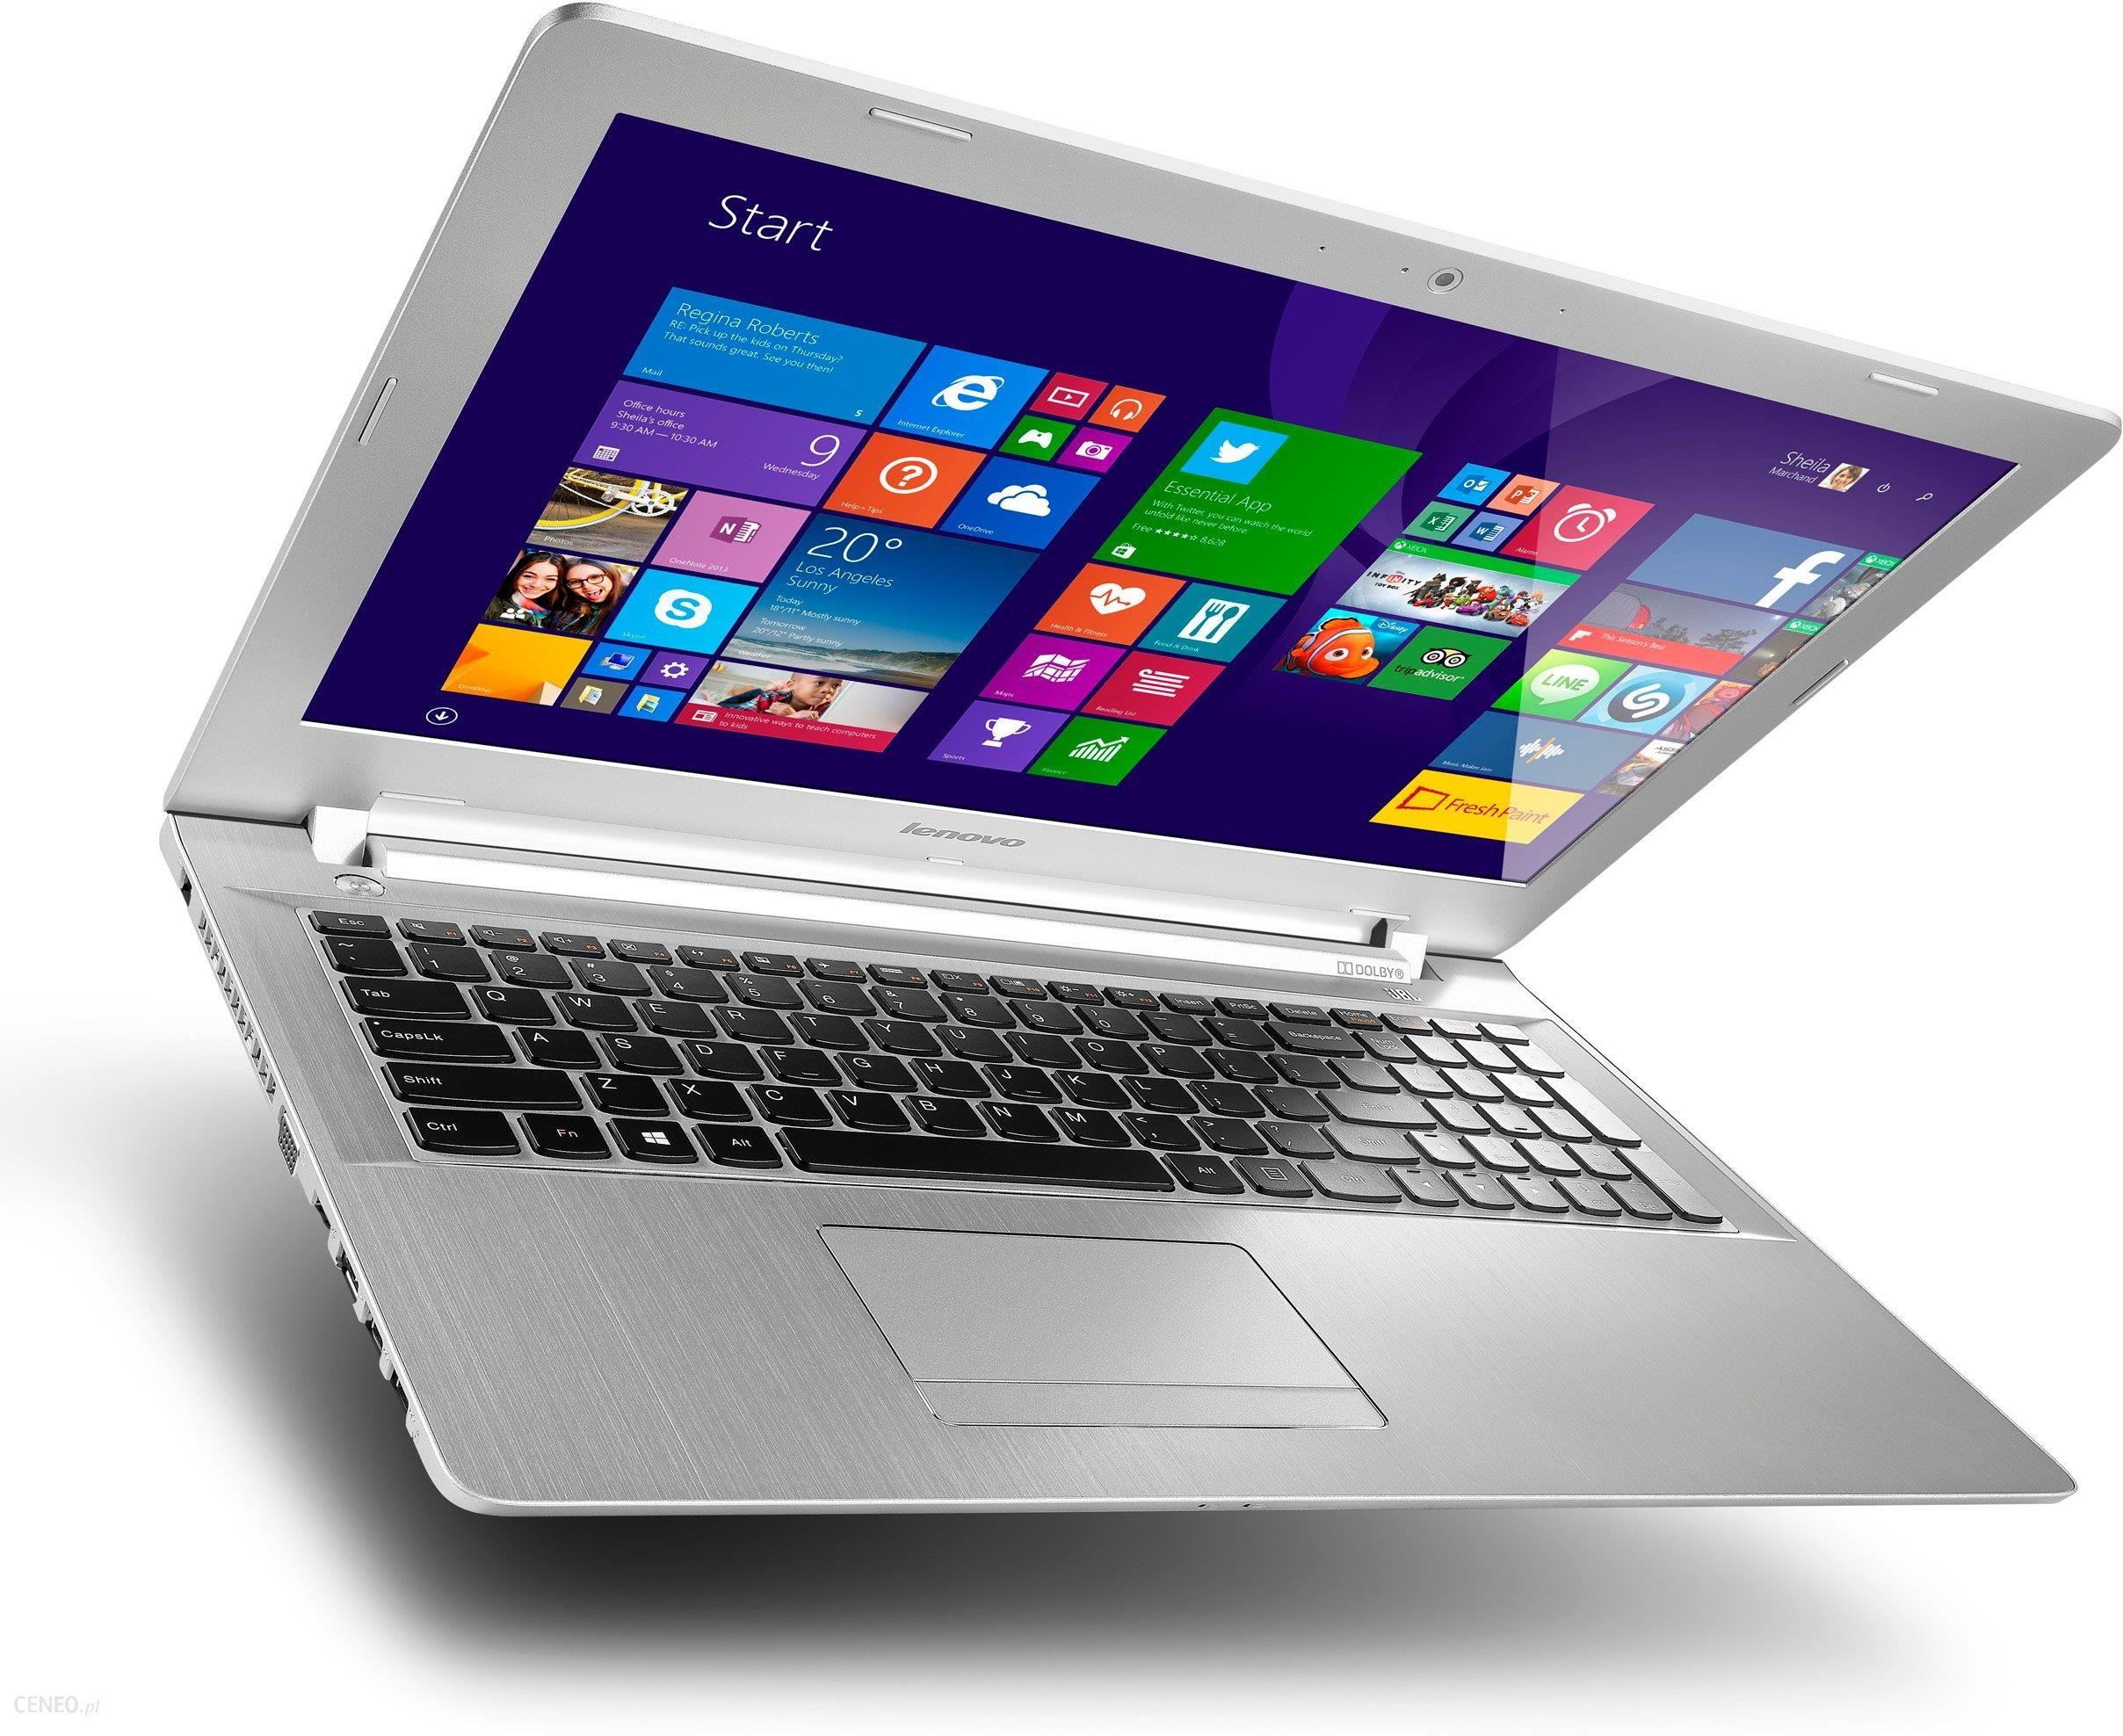 Laptop LENOVO Z51 70 80K601D2PB zdjęcie 1